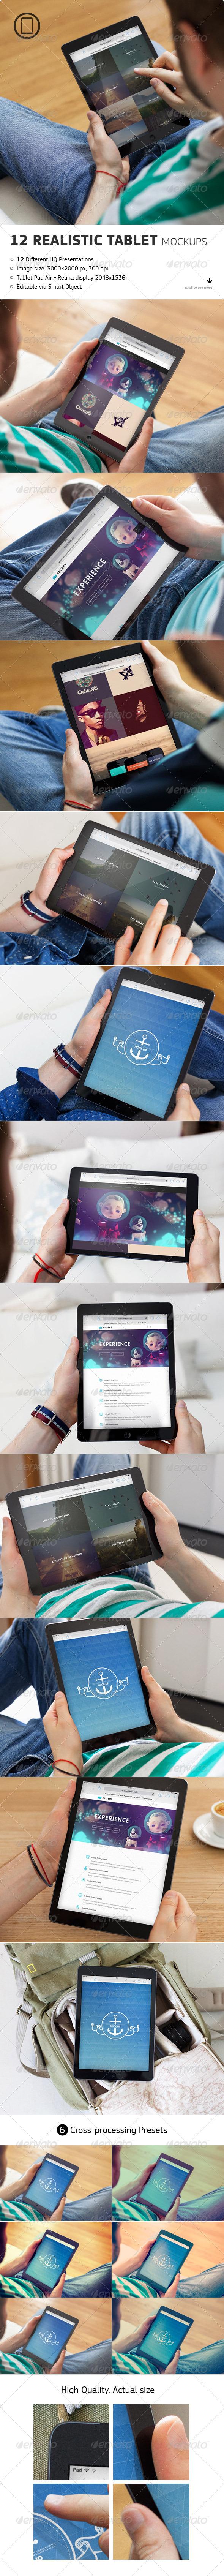 Realistic Tablet Mock-Up - Mobile Displays